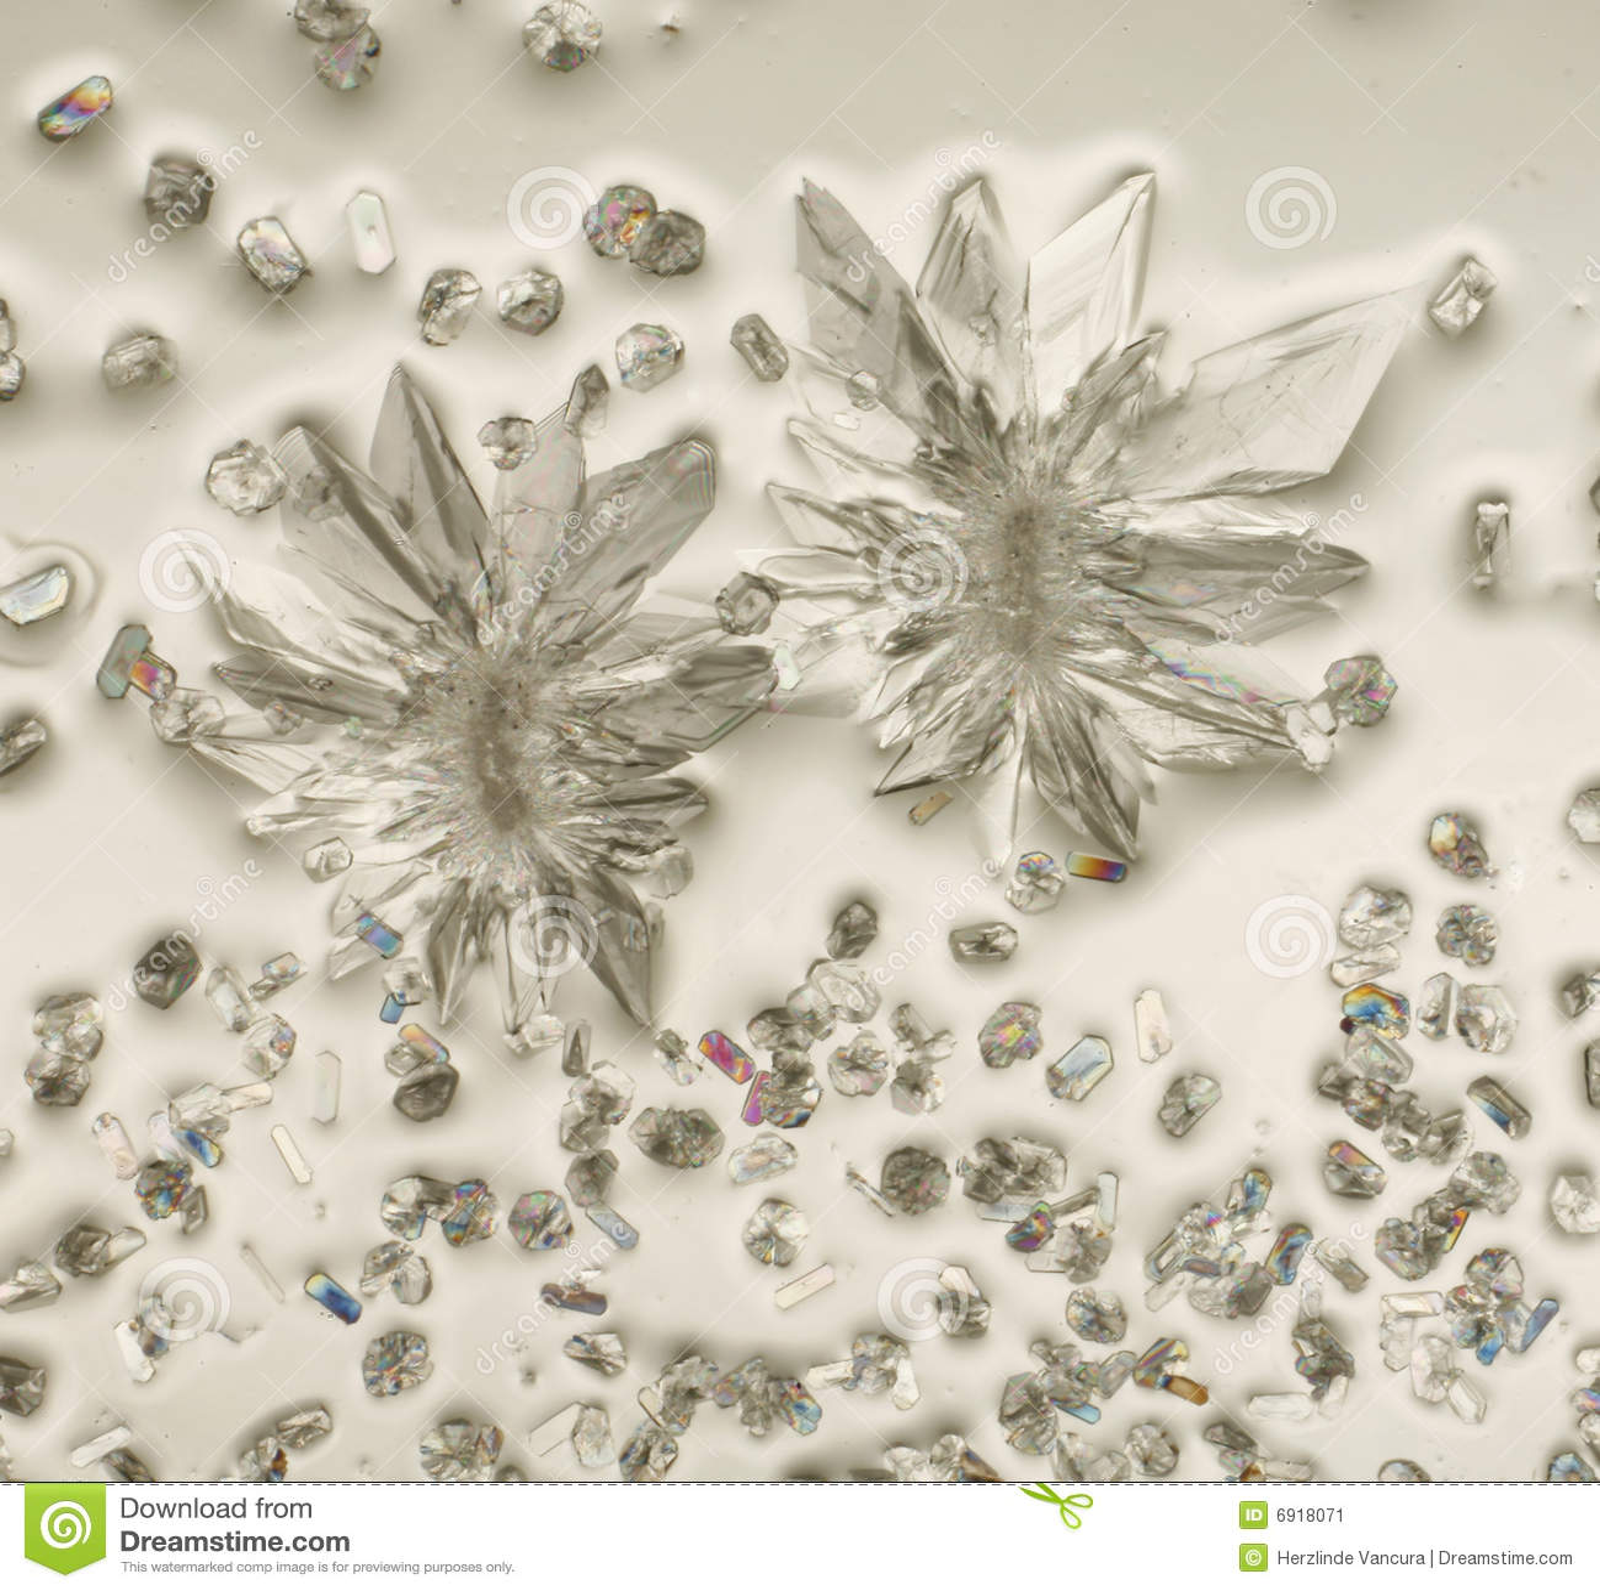 Cristales en luz polarizada